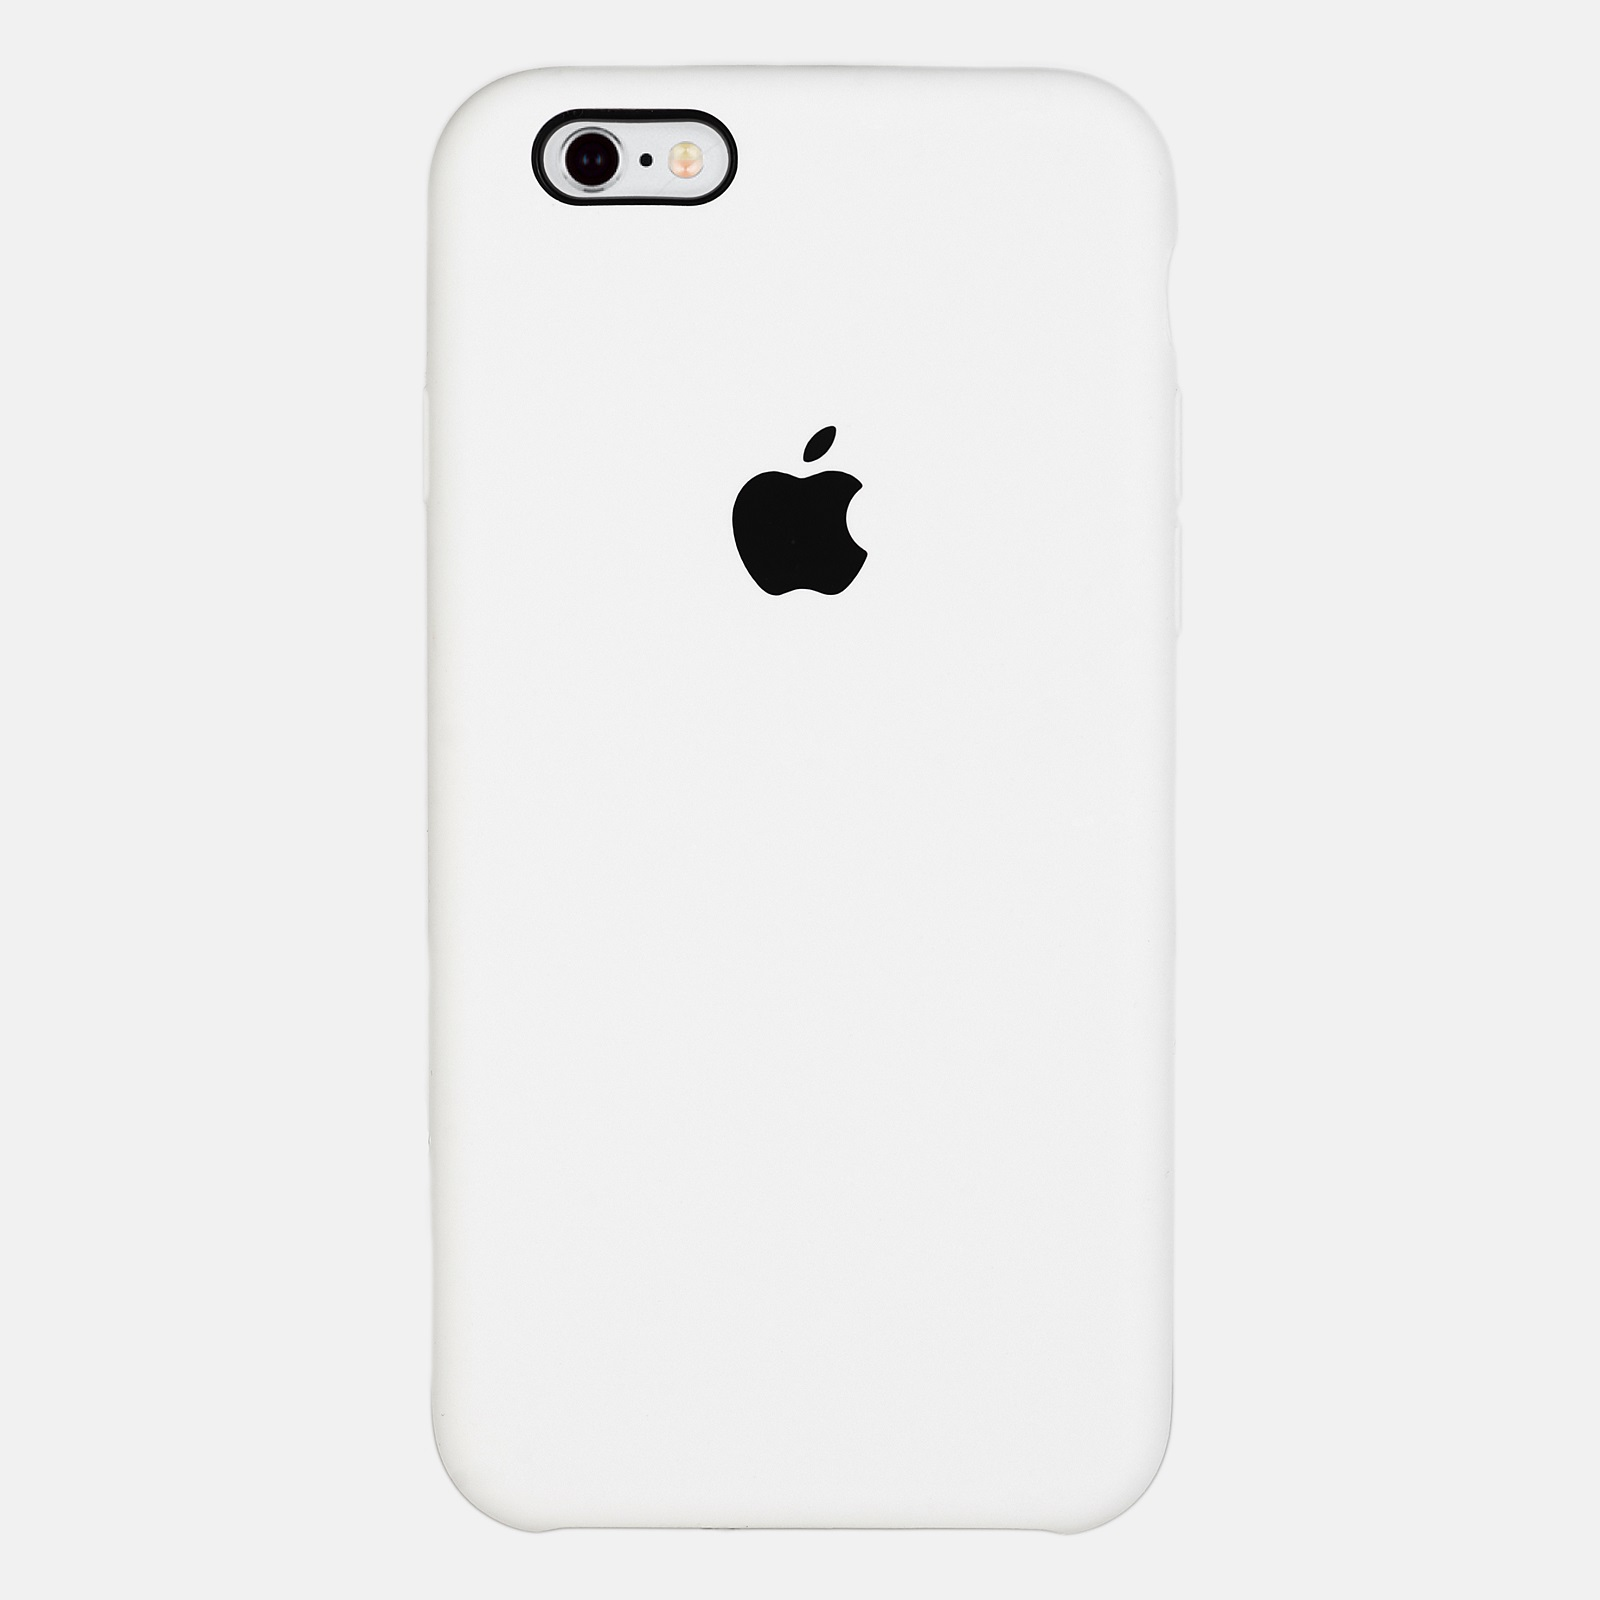 Белый чехол Silicone Case для iPhone 6/6S